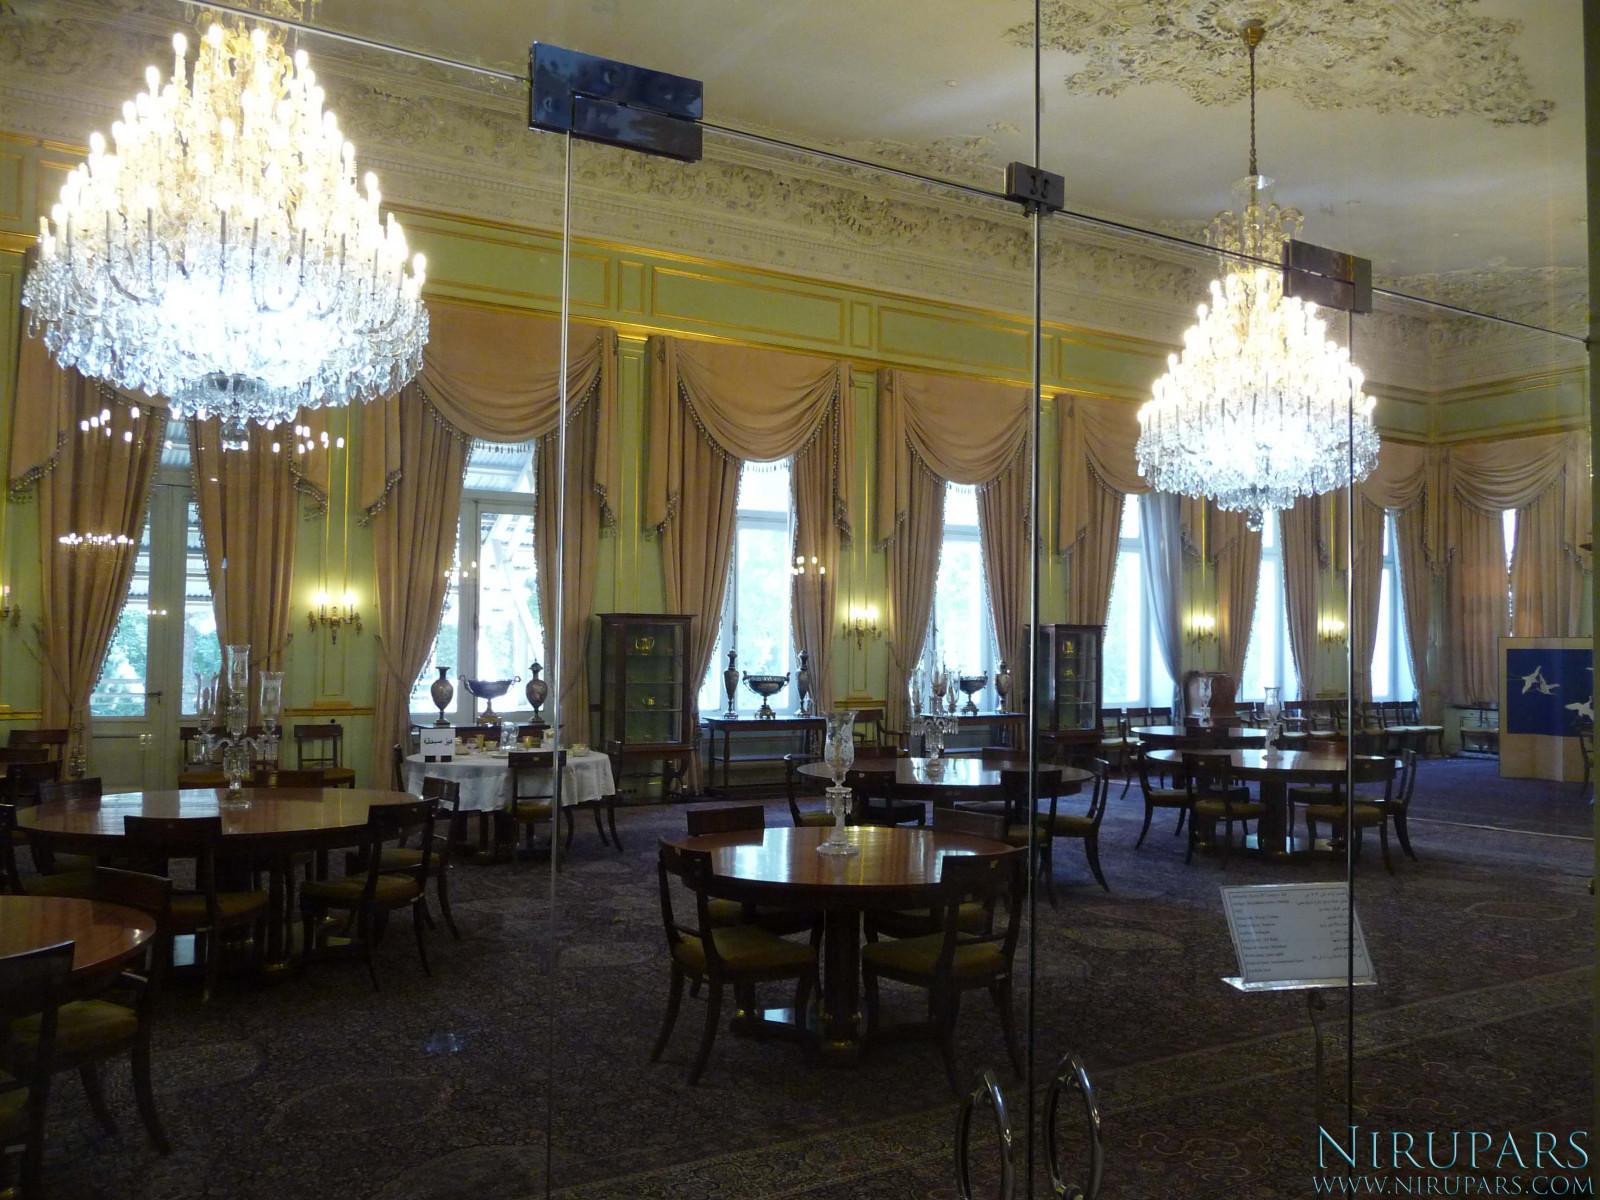 Sadabad Palace Complex - White Palace - Upper Floor - Dining Room